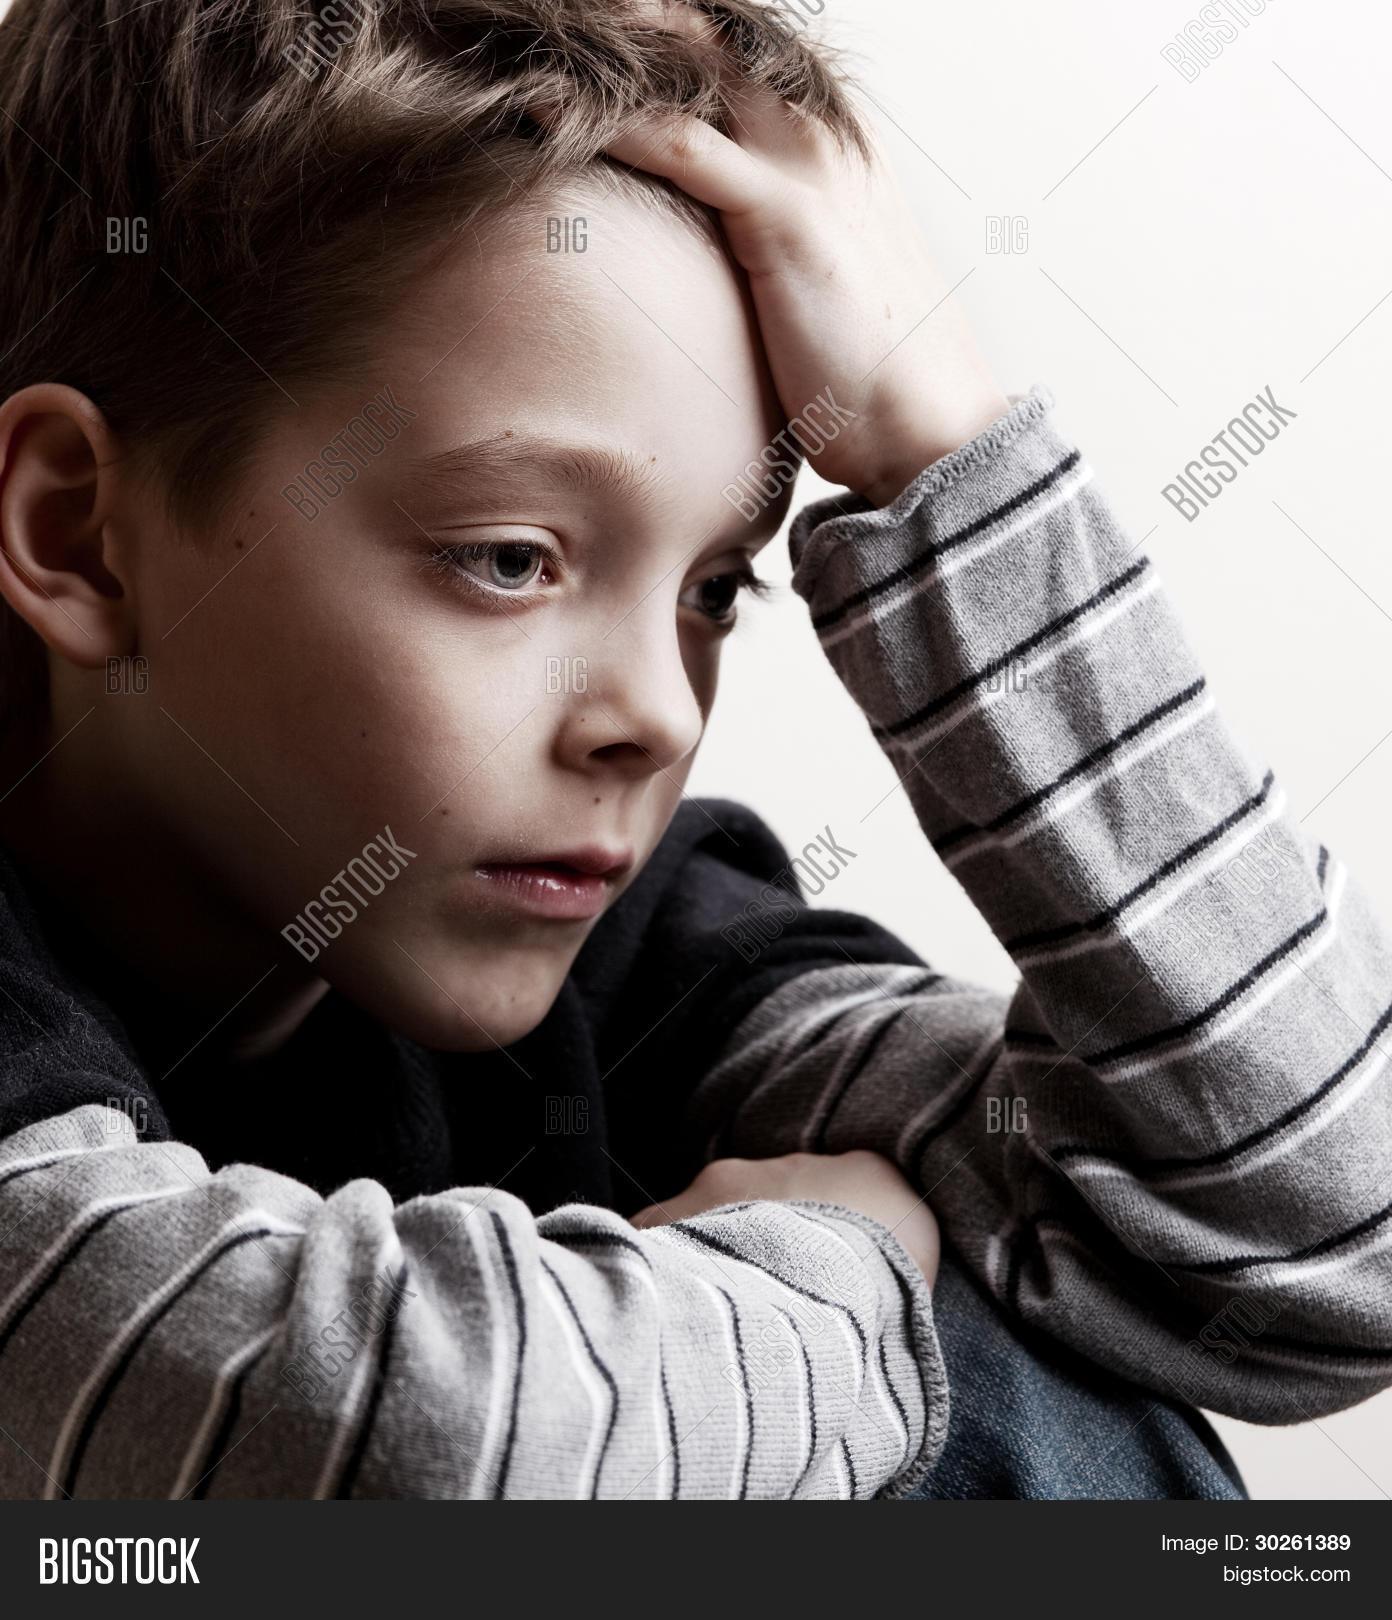 sad boy depressed image photo free trial bigstock